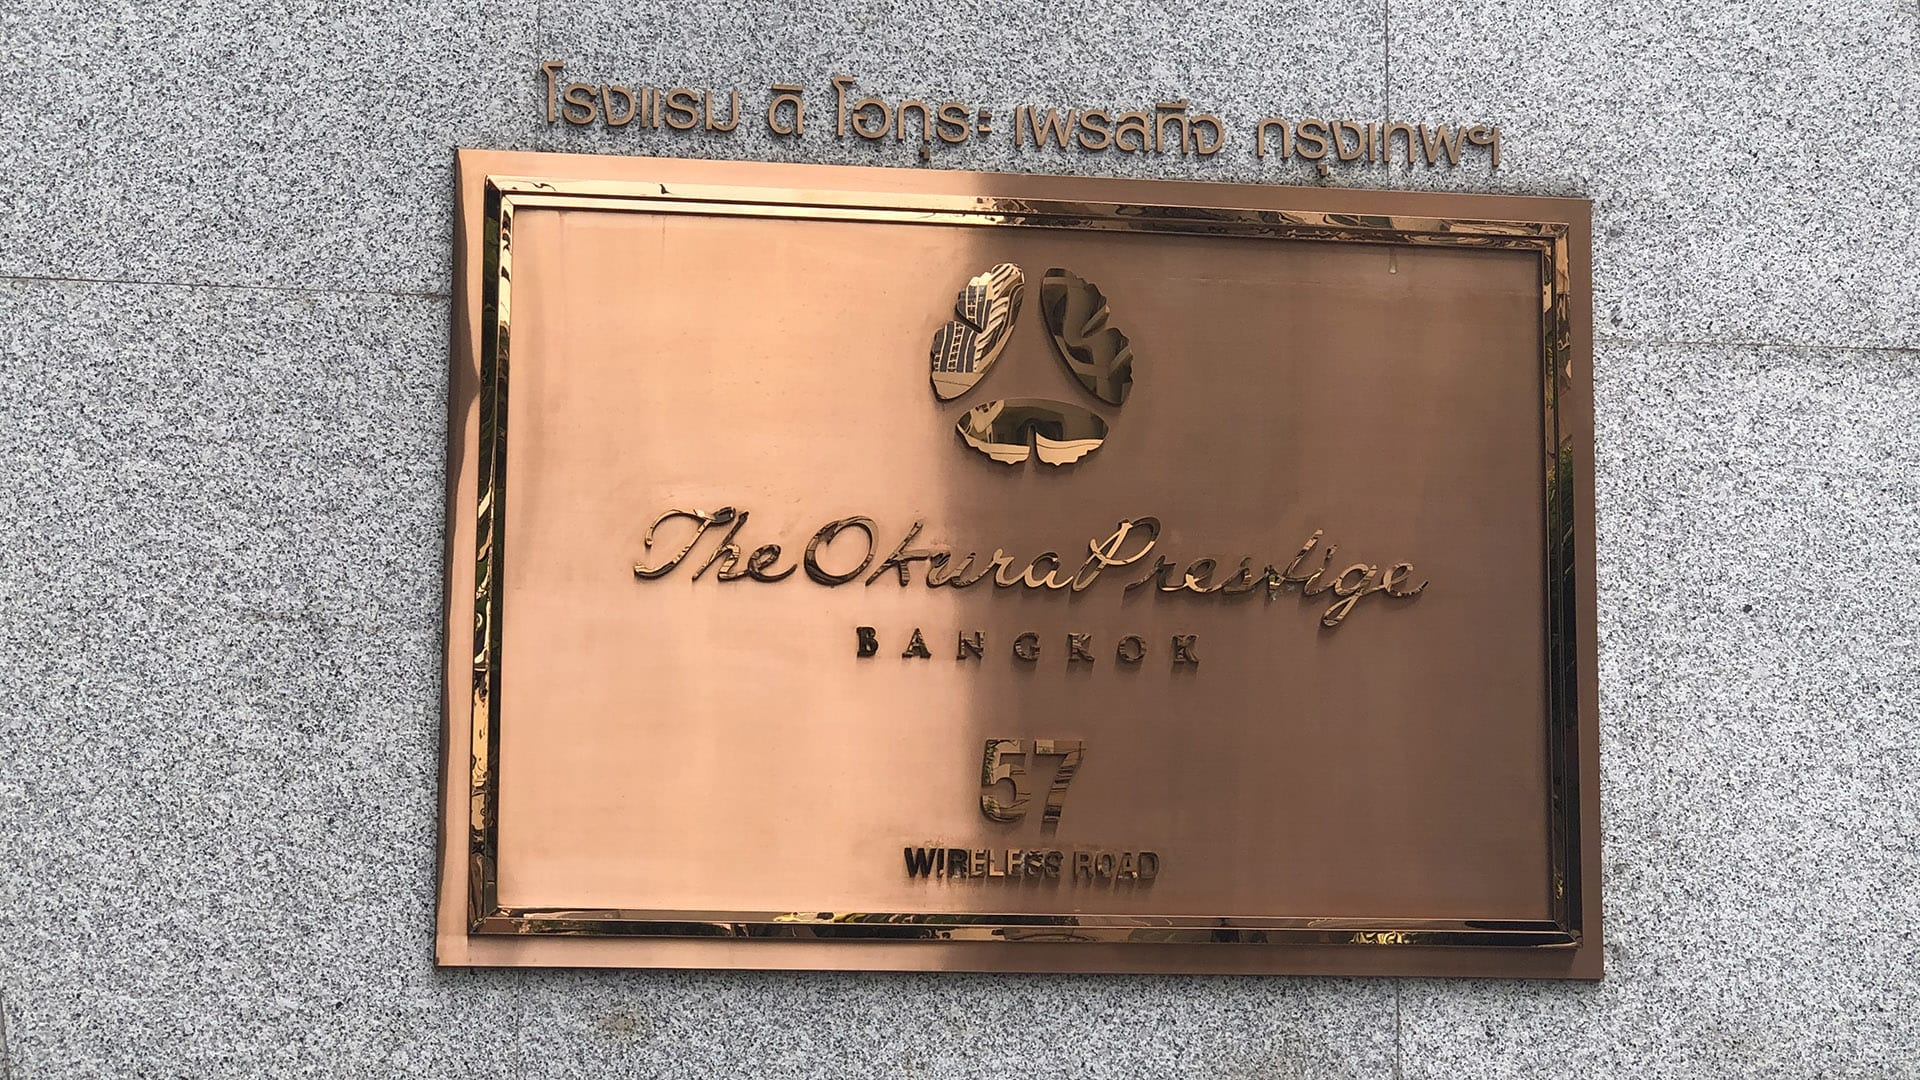 The Okura Prestige Bangkok, joining Japanese hospitality and Thai culture